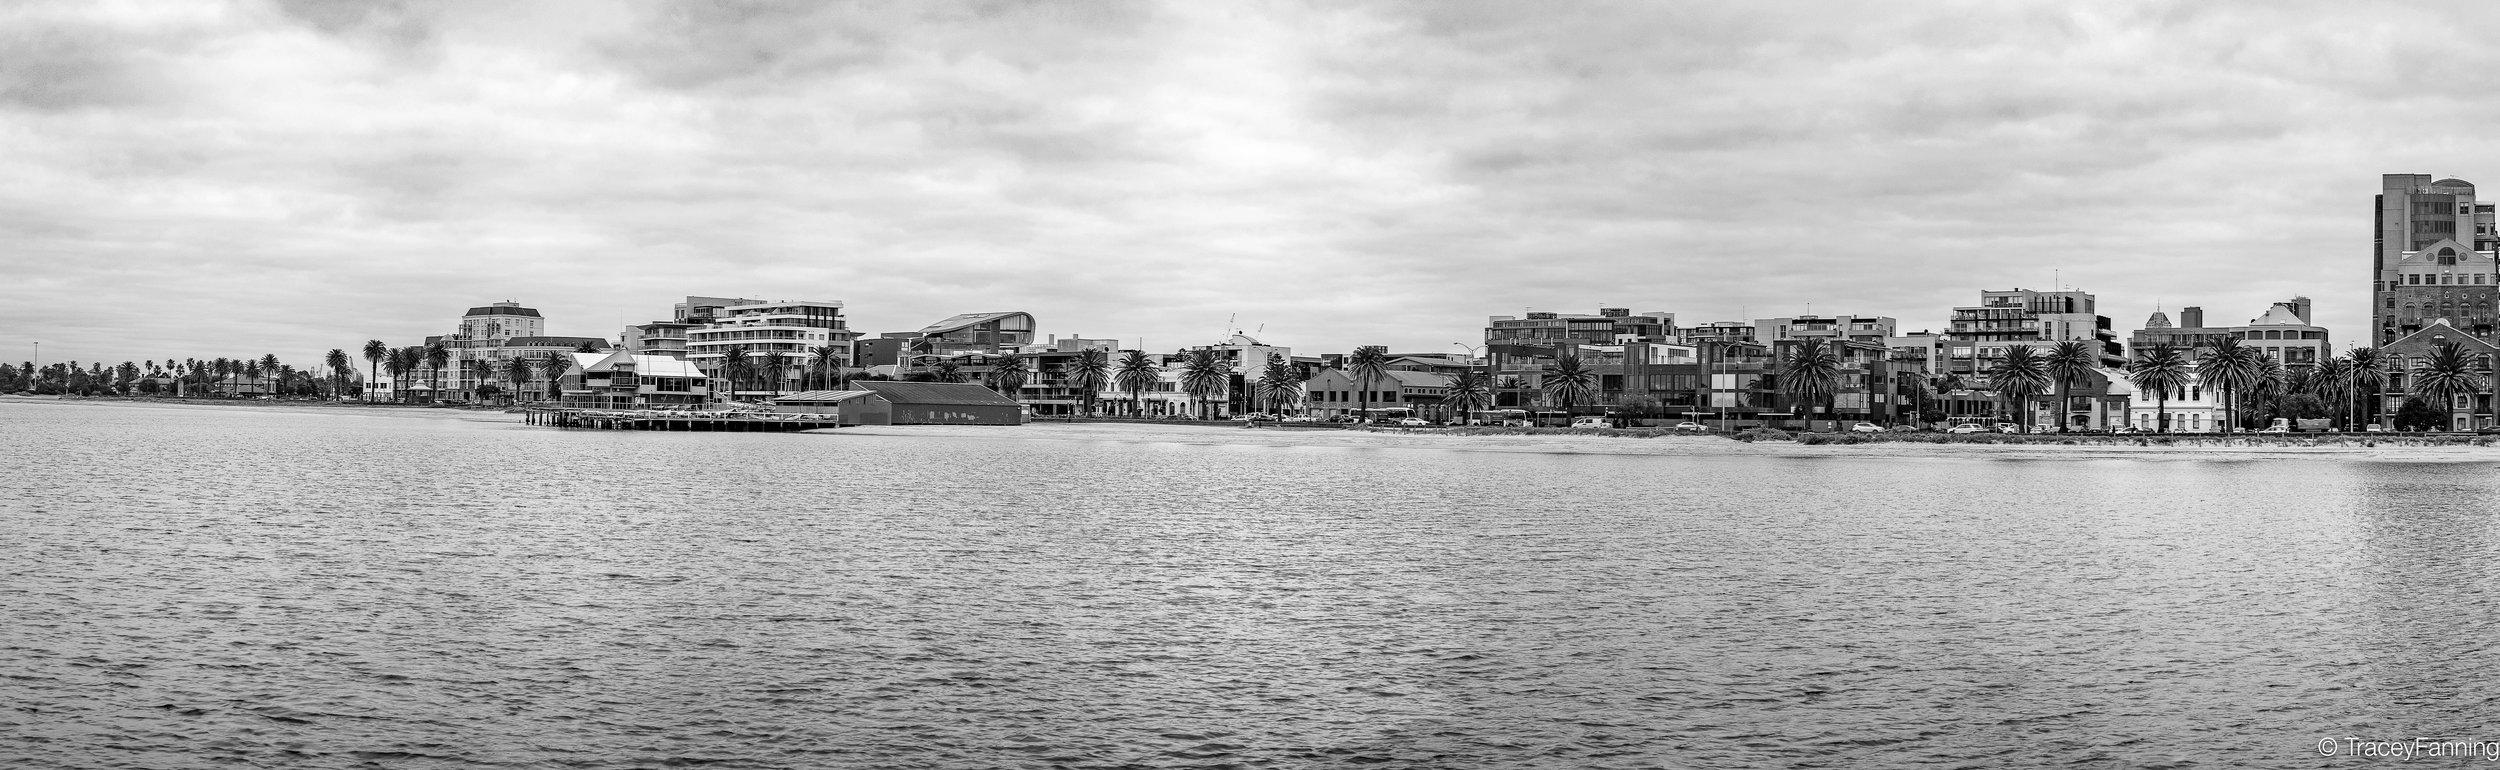 Port Melbourne Panorama BW.jpg